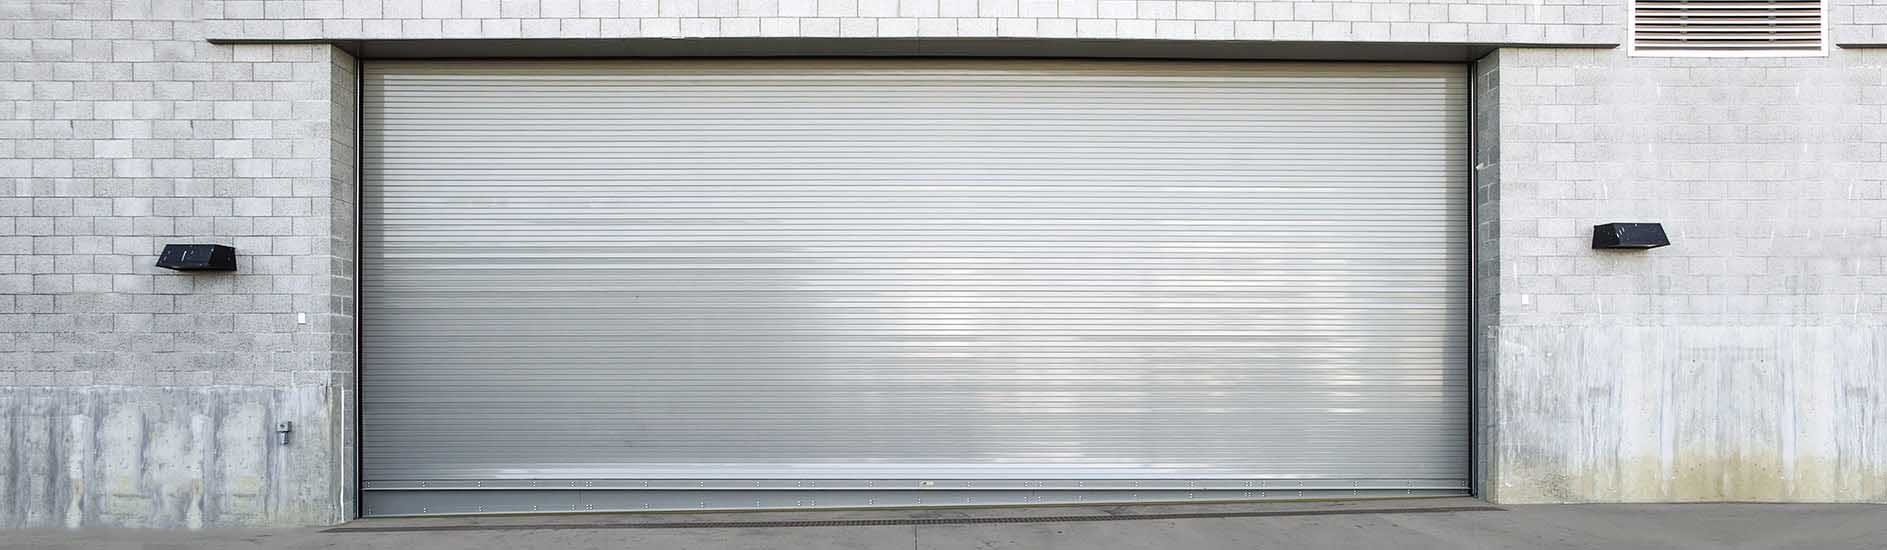 Commercial Rolling Service Doors